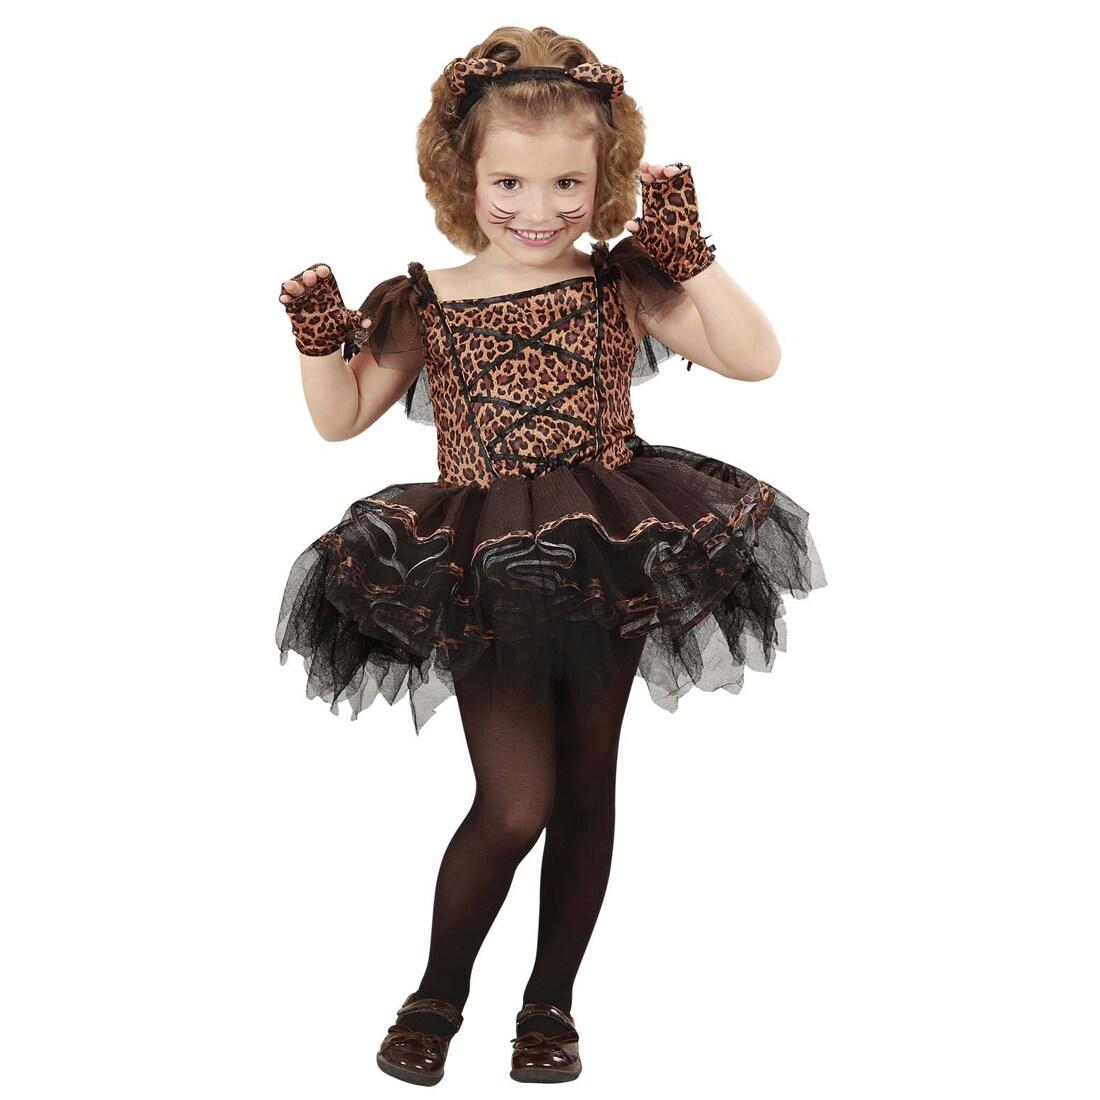 Ballerina Kostüm Leopard Tutu Katzenkostüm Kinder